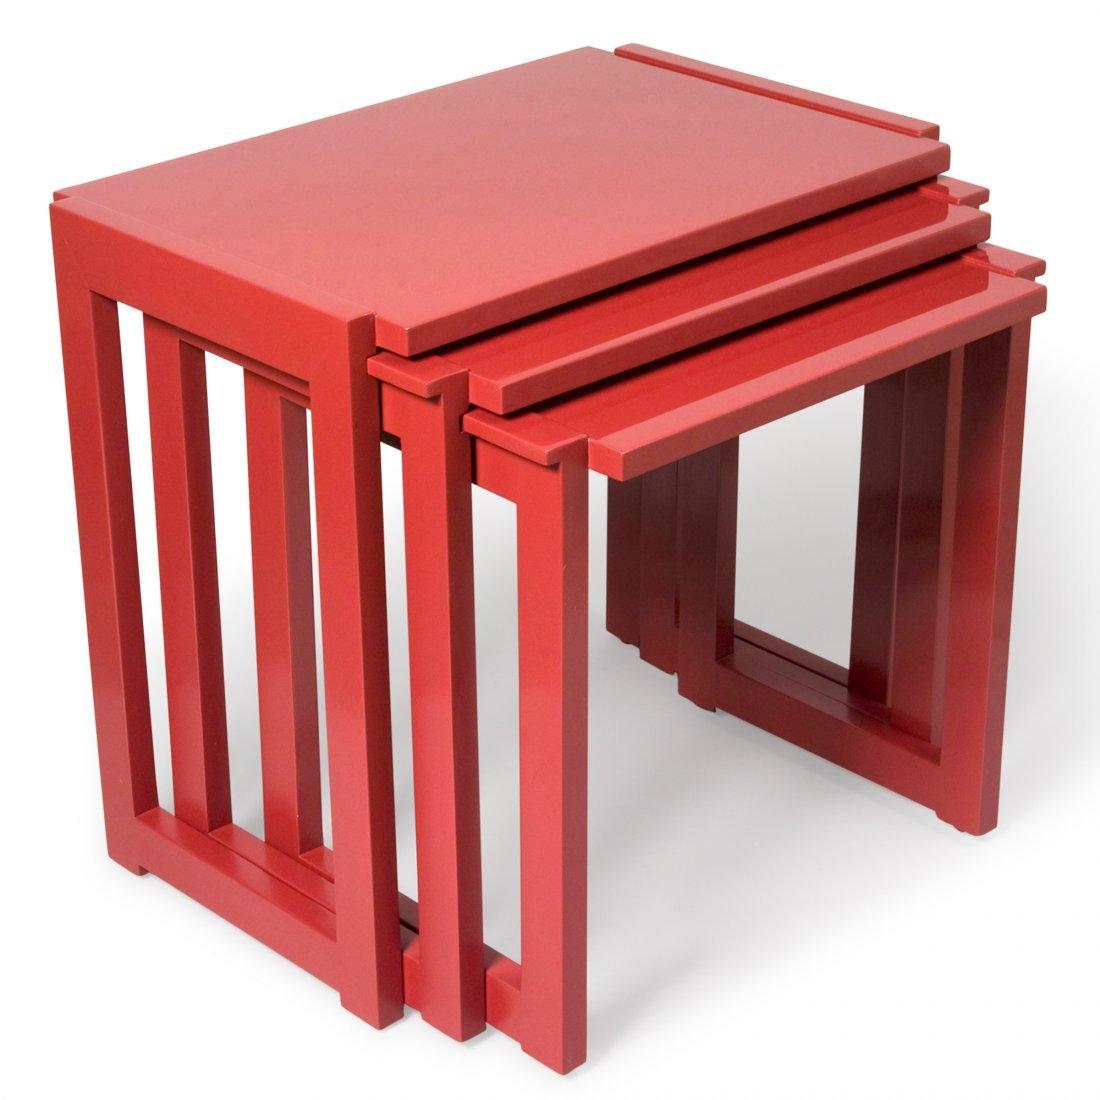 Paul Laszlo Lacquered Nest of Tables